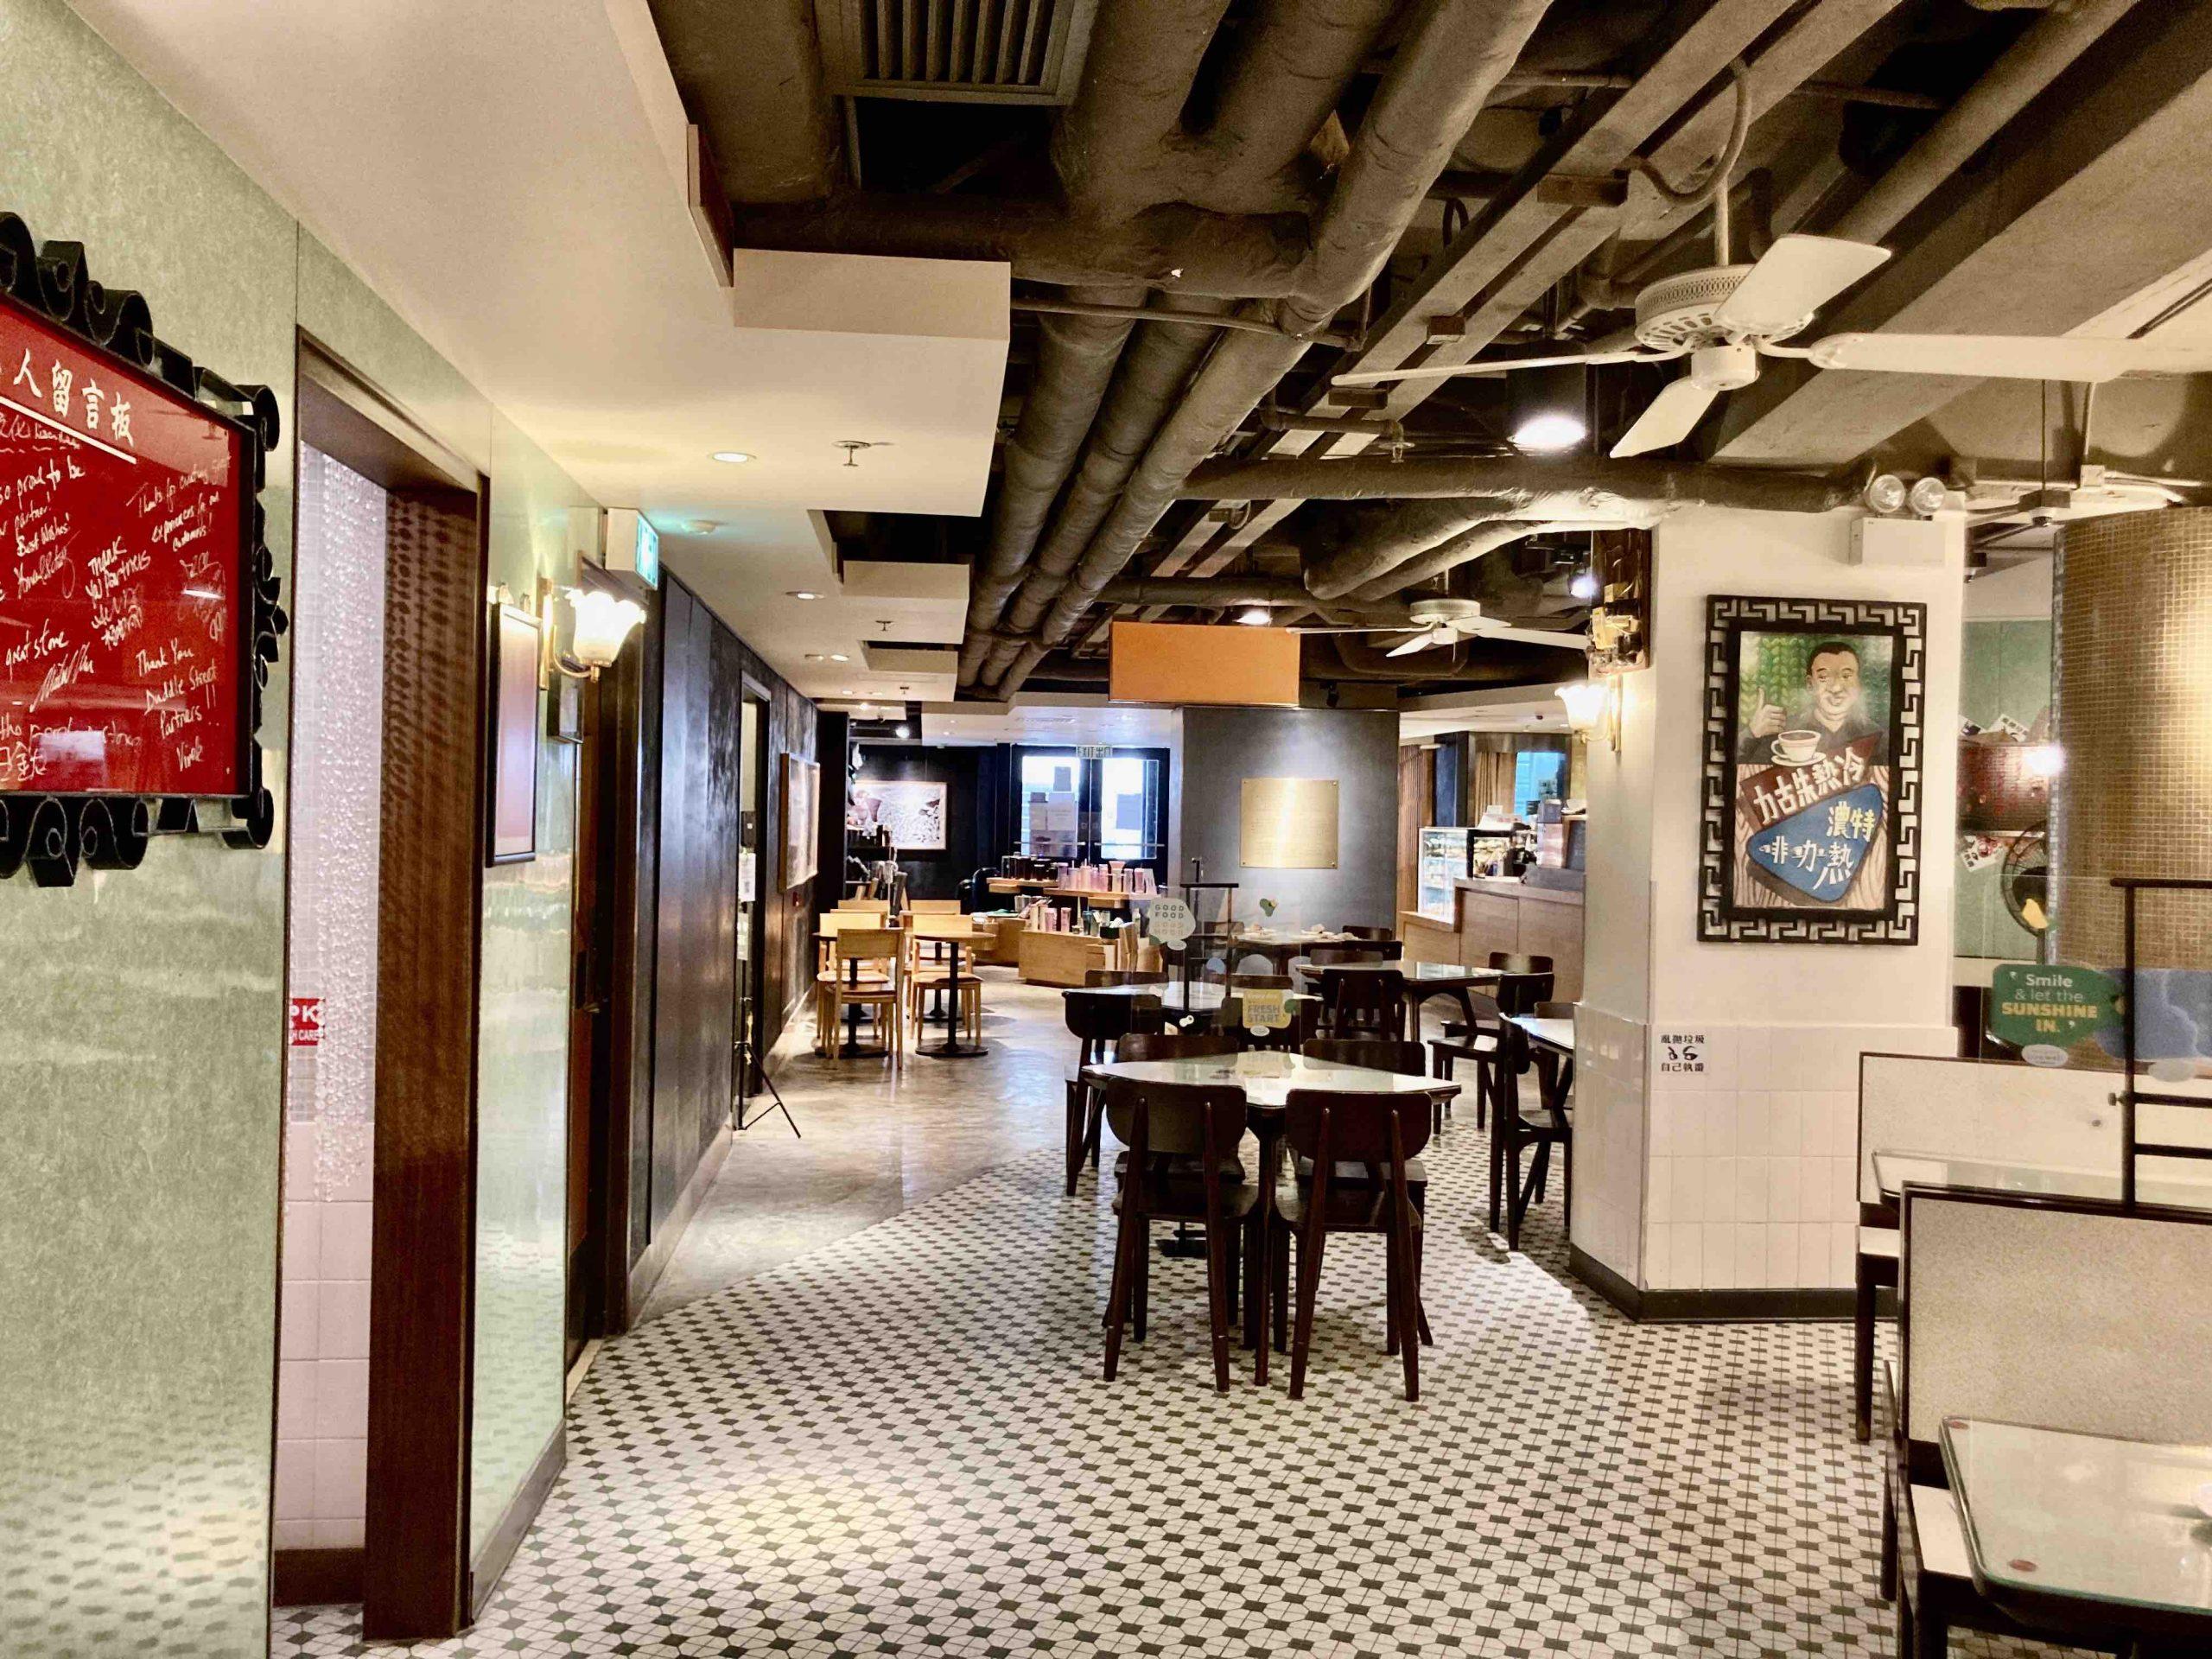 HK Central Cafe for Rent in CBD